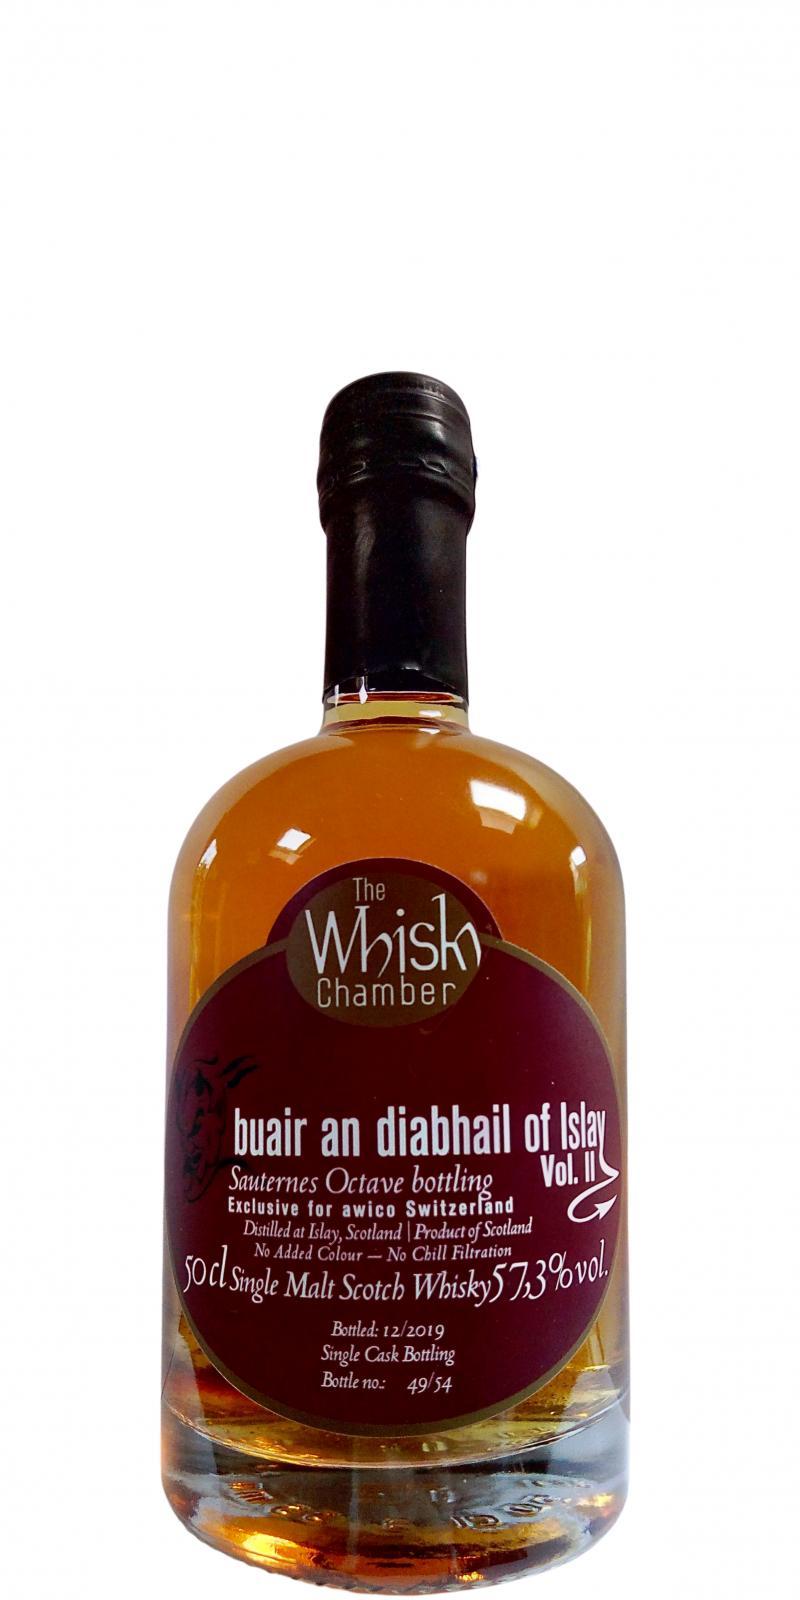 buair an diabhail of Islay Special ex Sauternes cask bottling Vol. II